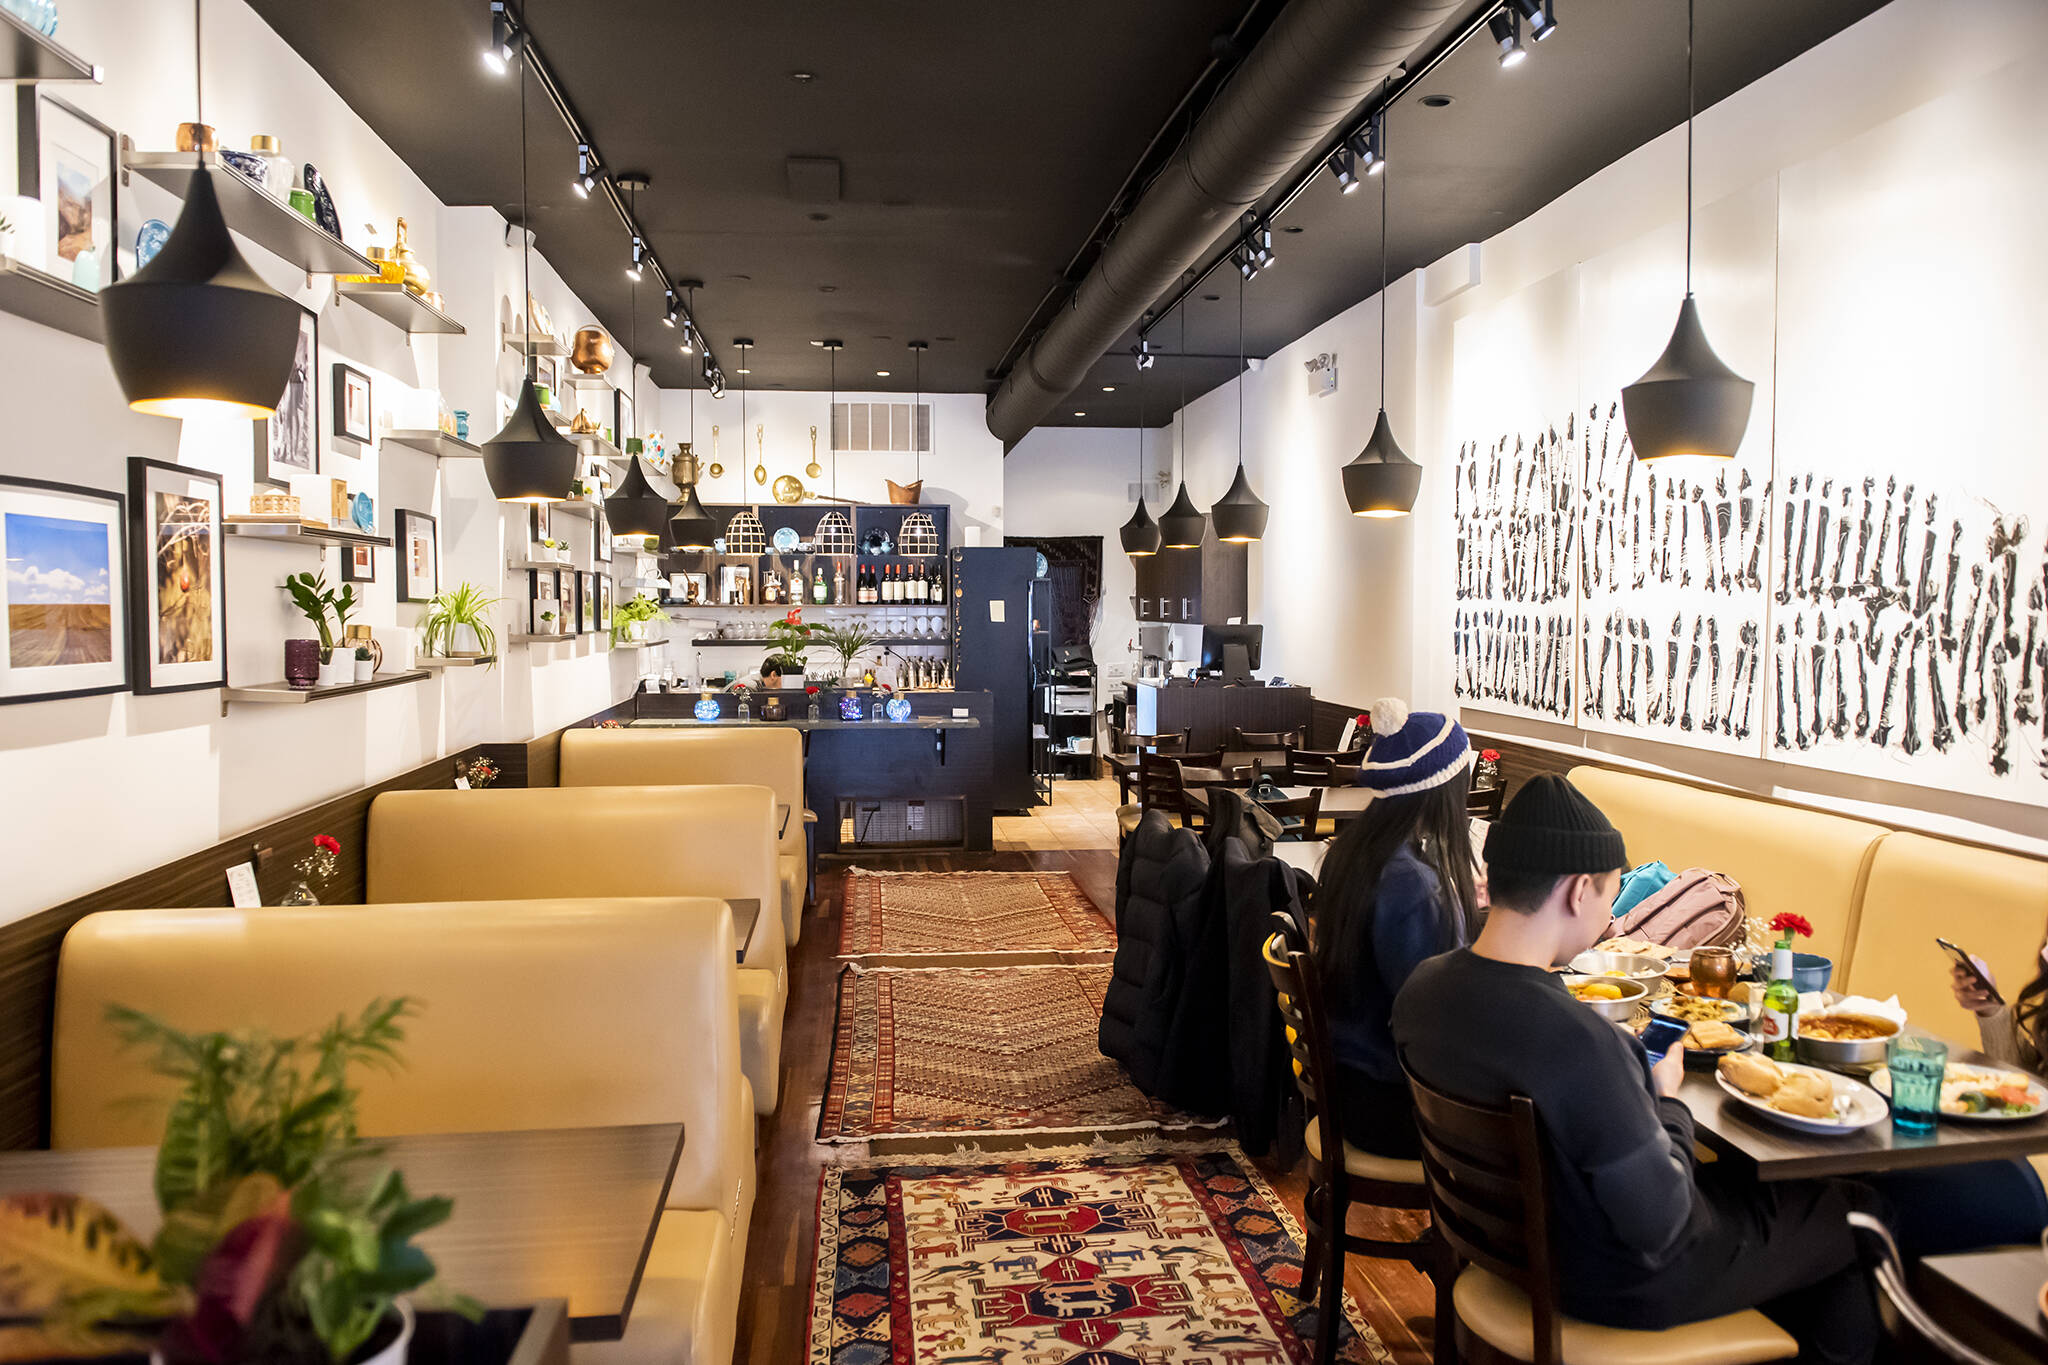 danforth restaurants